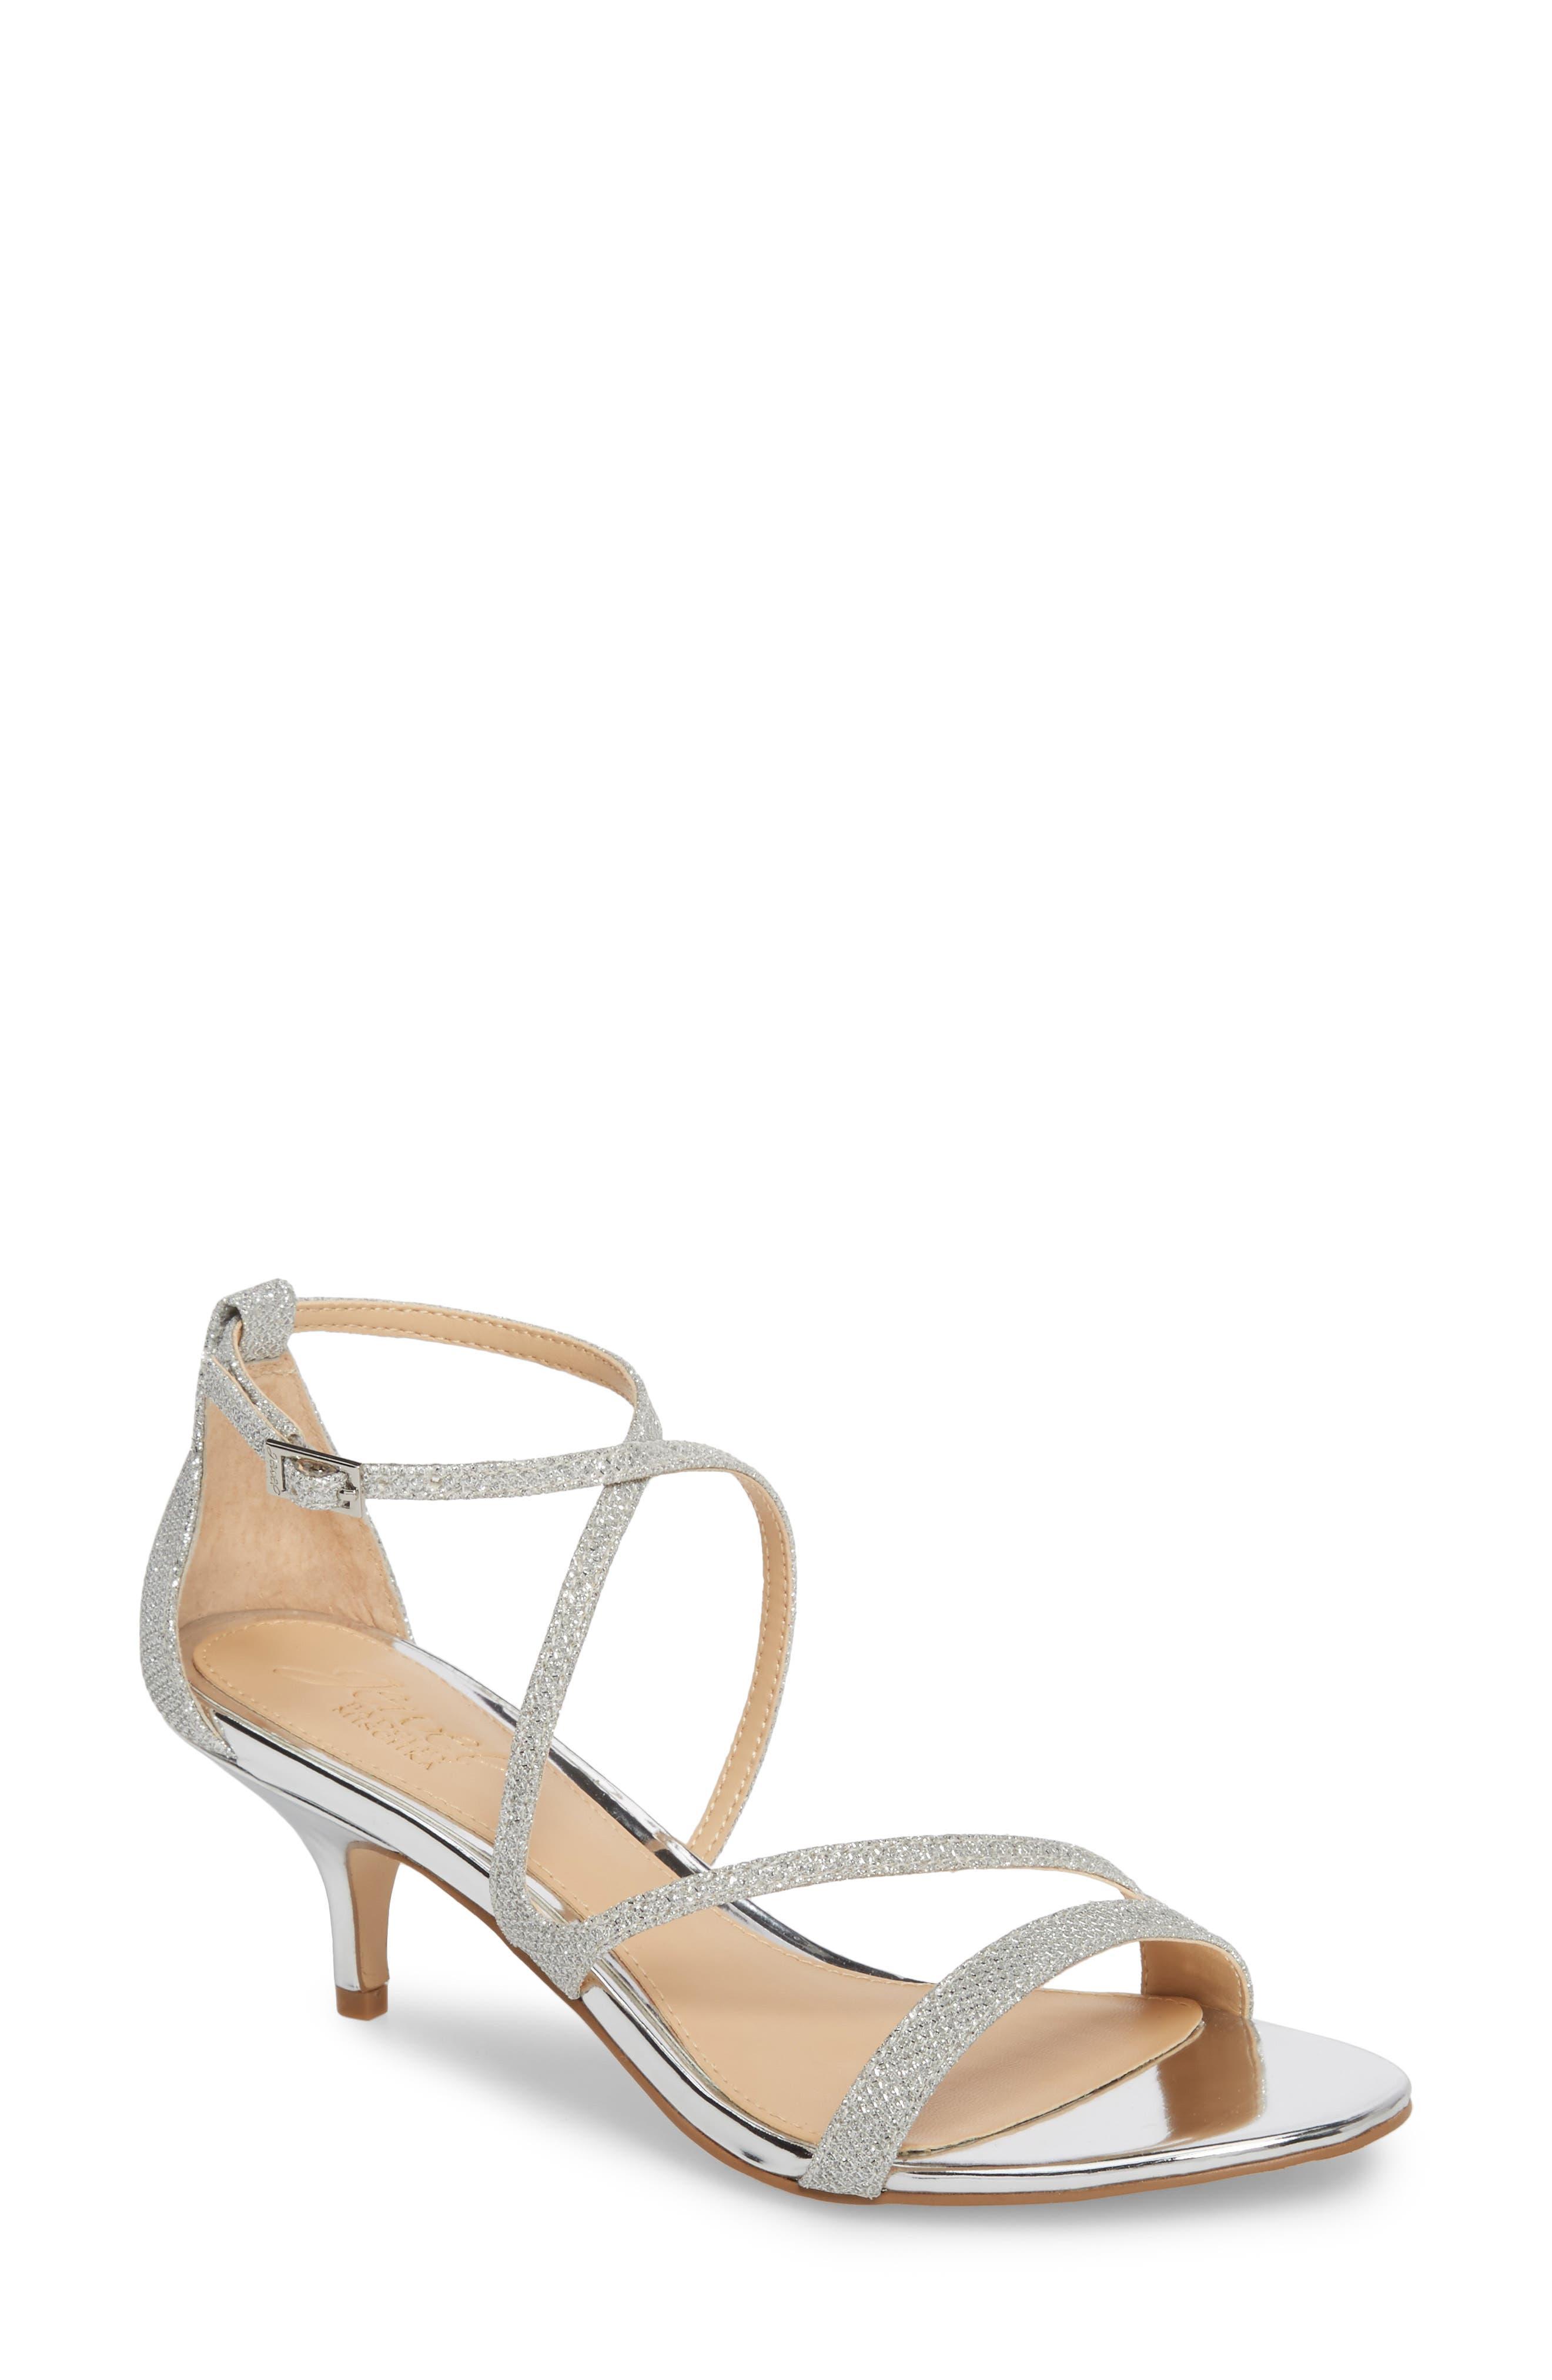 Gal Glitter Kitten Heel Sandal,                         Main,                         color, SILVER GLITTER FABRIC